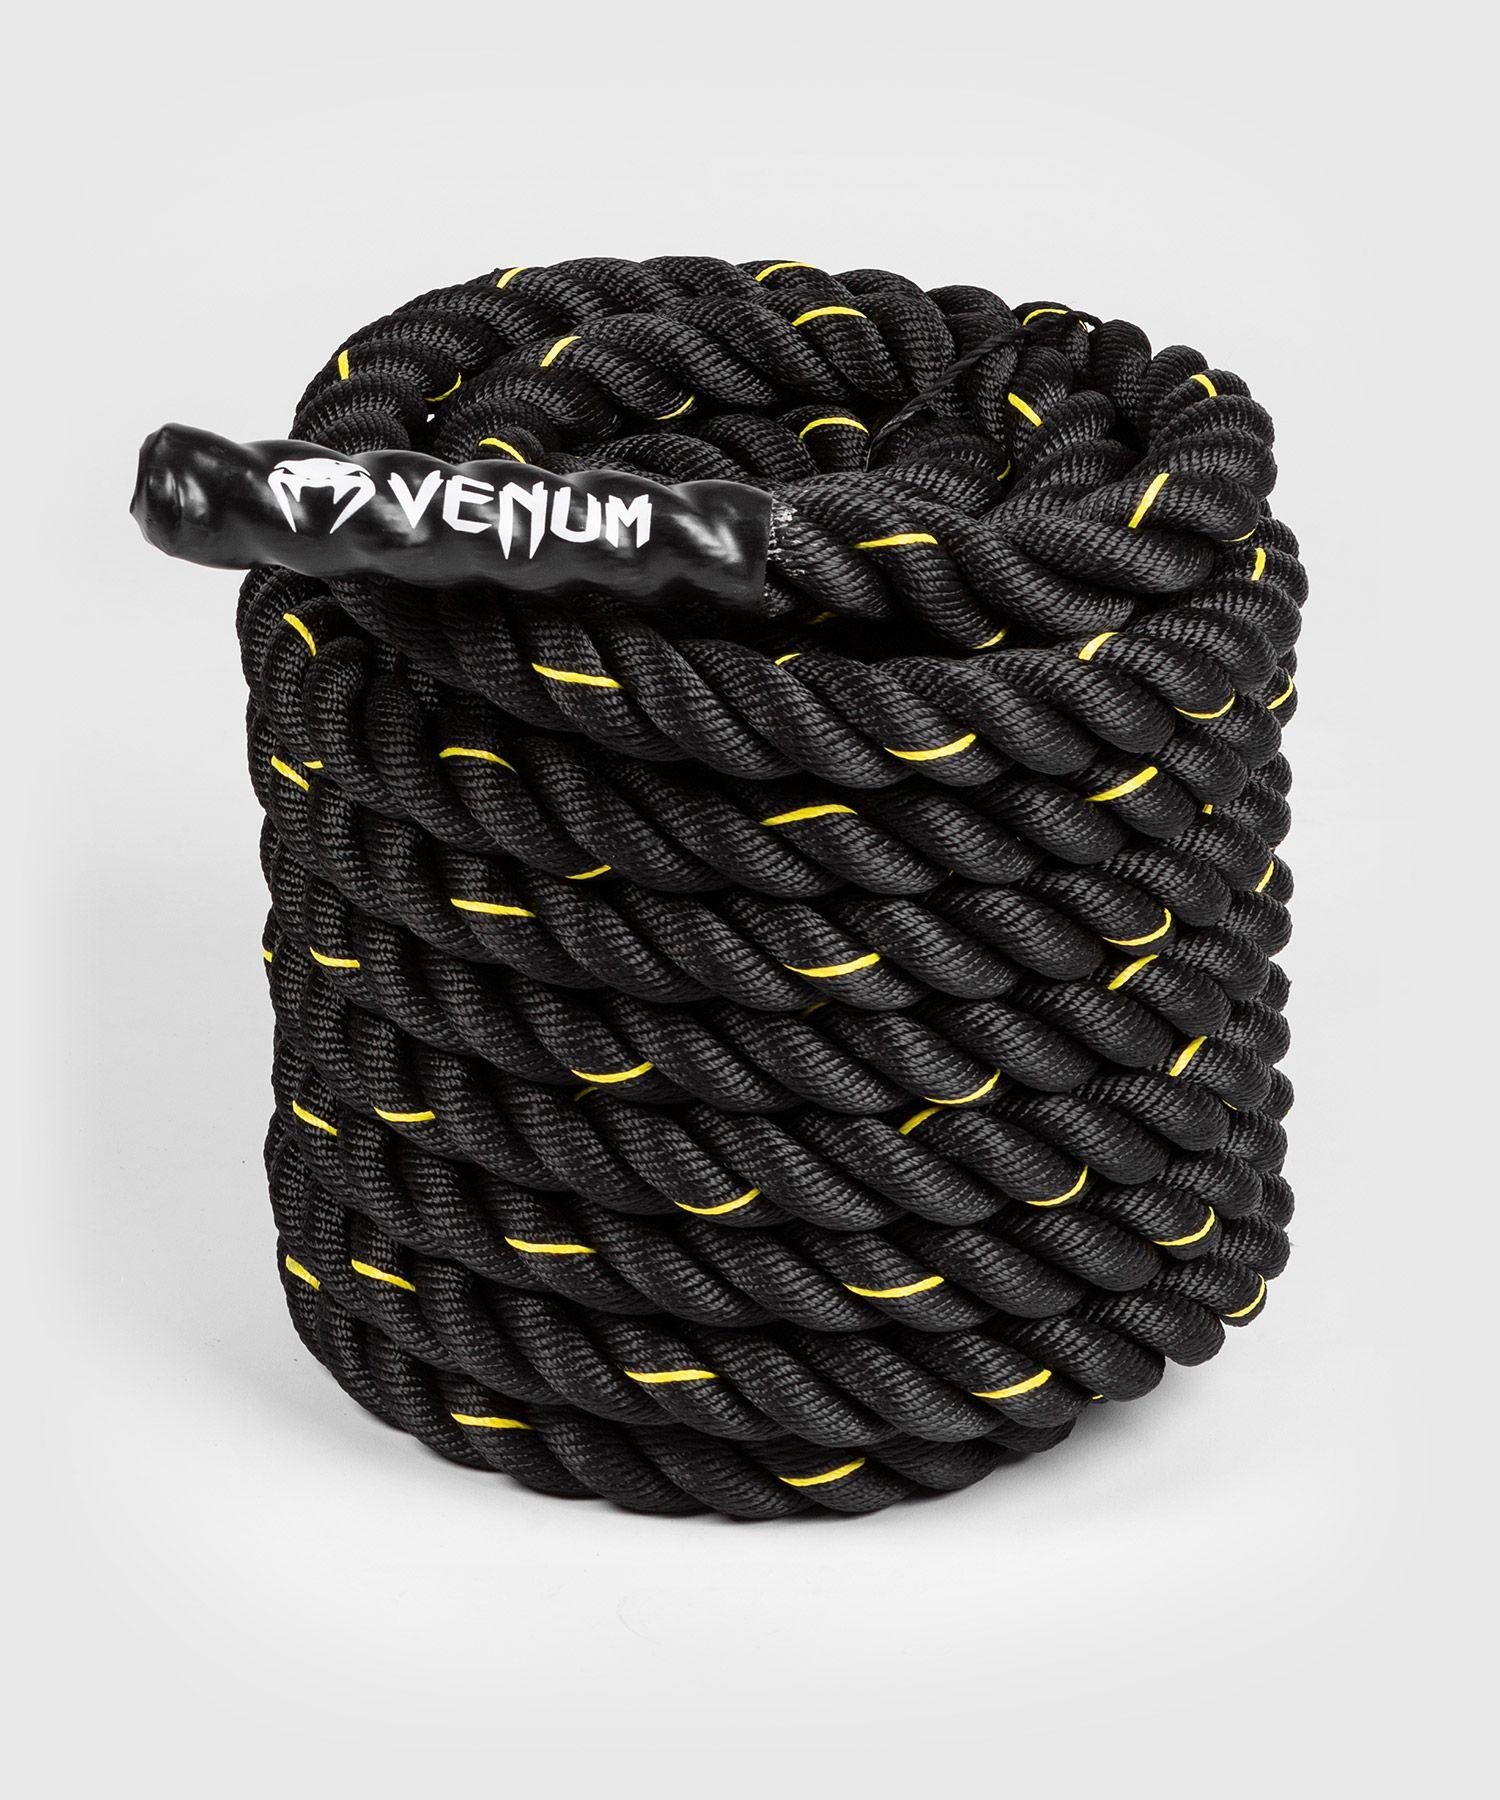 Corde da onda Challenger Venum - 12m